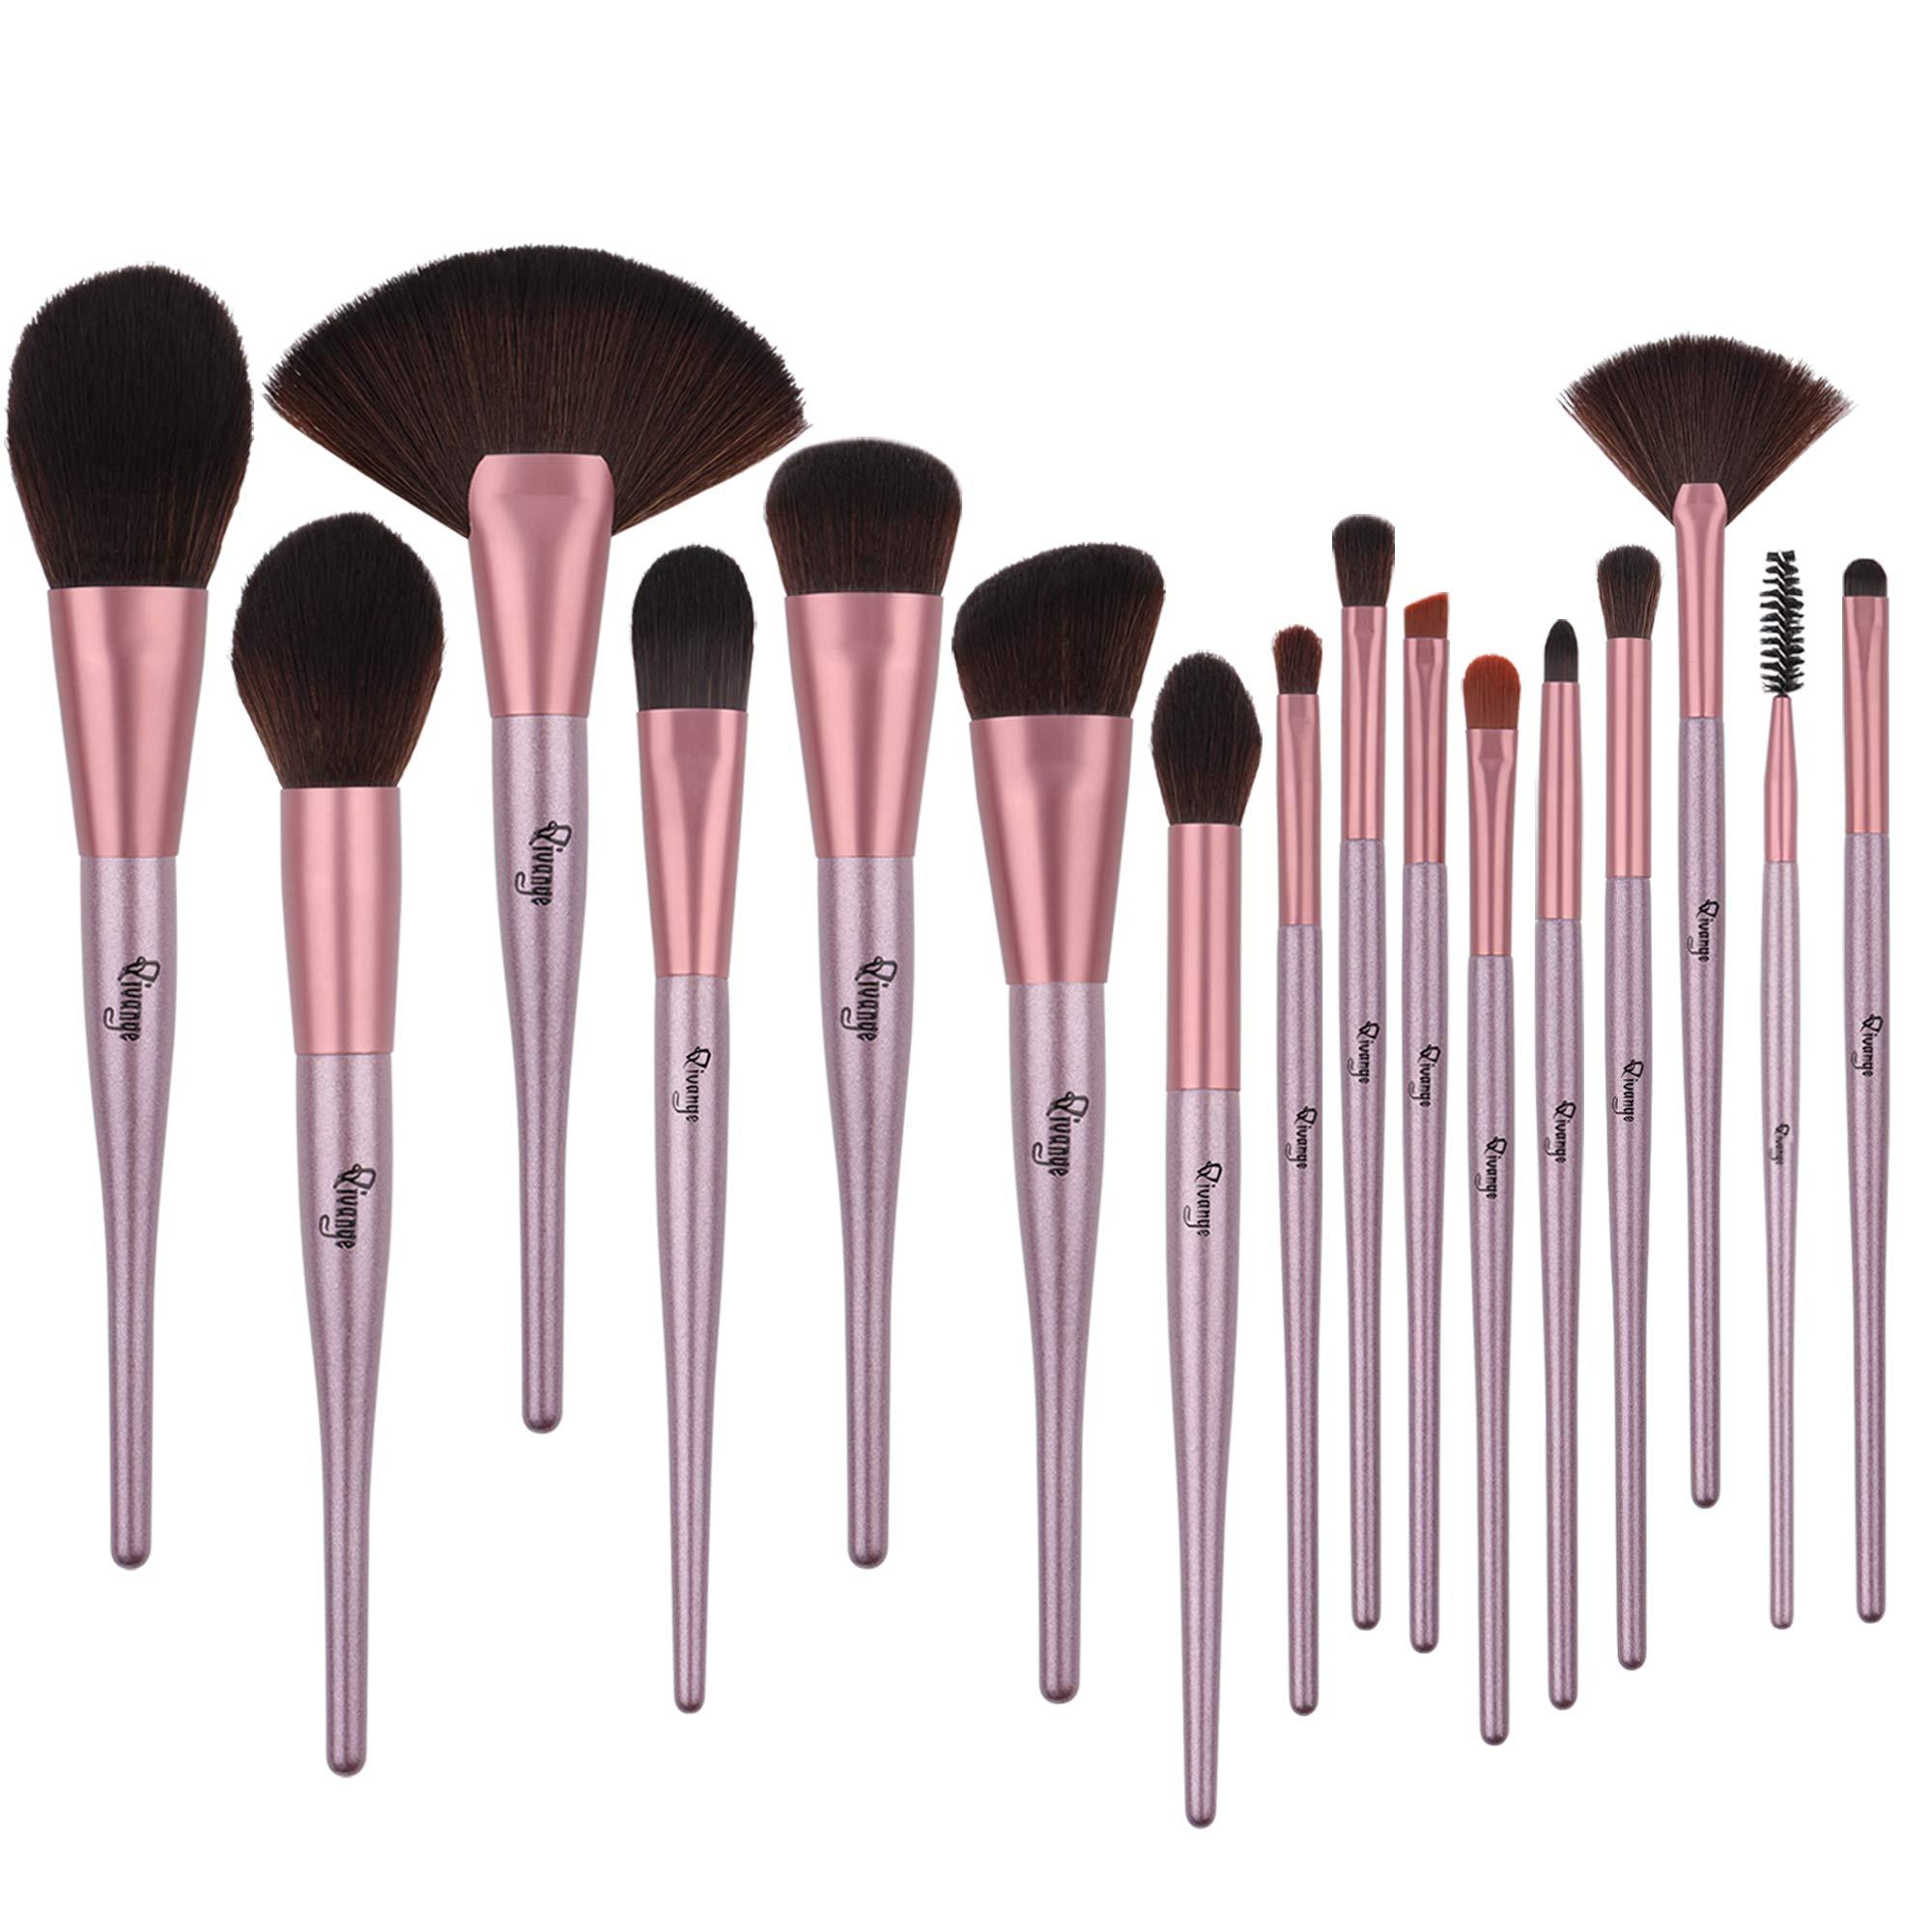 Qivange Fan Makeup Brushe 16PCS Face Foundation Powder Kabuki Makeup Brush Set Belly-type Handle Softer Professional Cosmetic Make up Brushes Kit for Blending Concealers Highlighter Eye Shadows